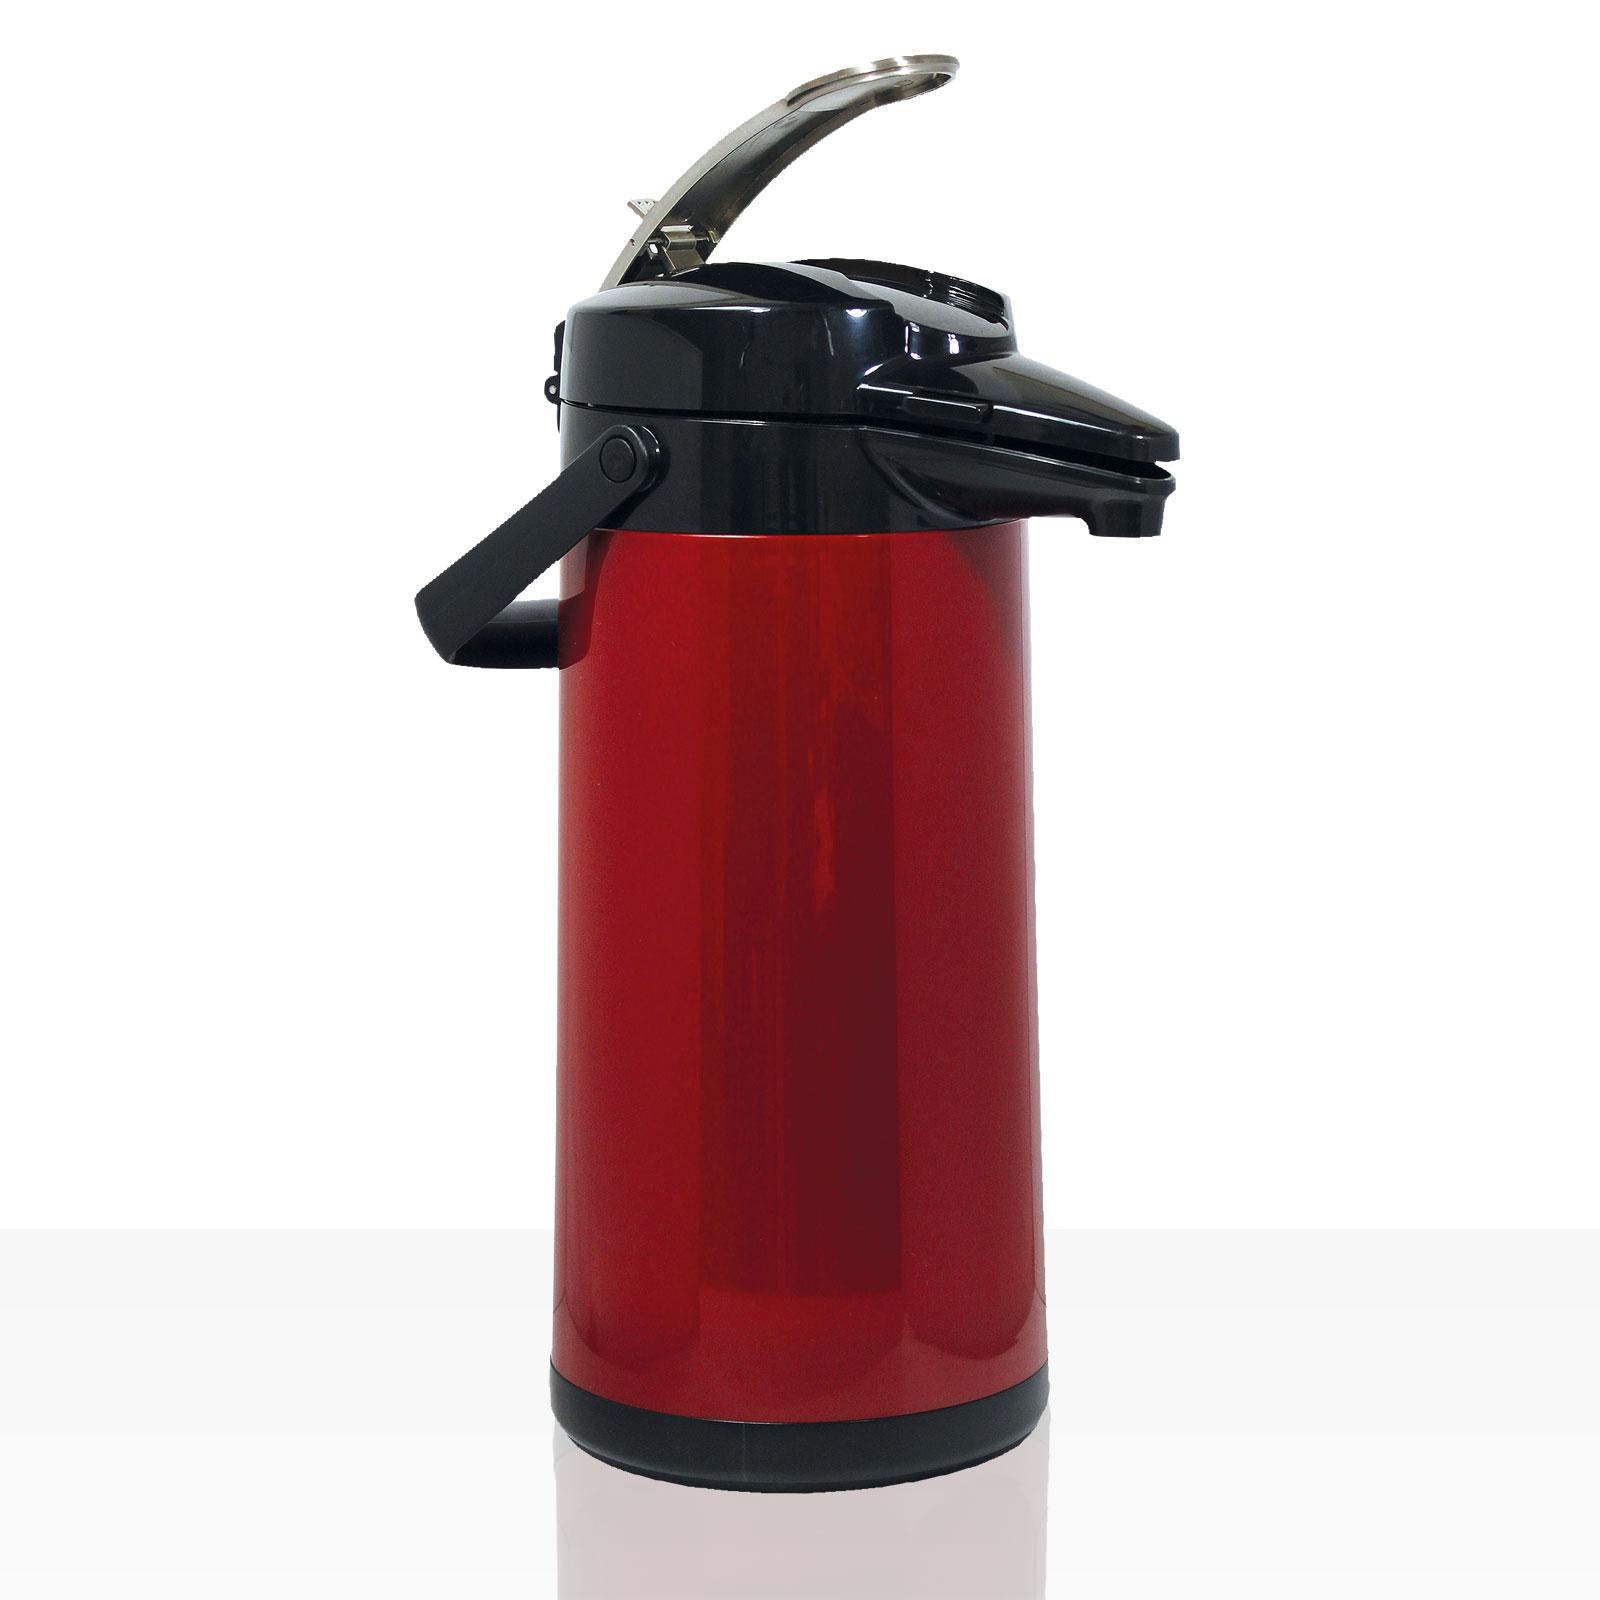 Bonamat Airpot Furento Pumpkanne 2,2l für TH - Glaseinsatz Matt Rot